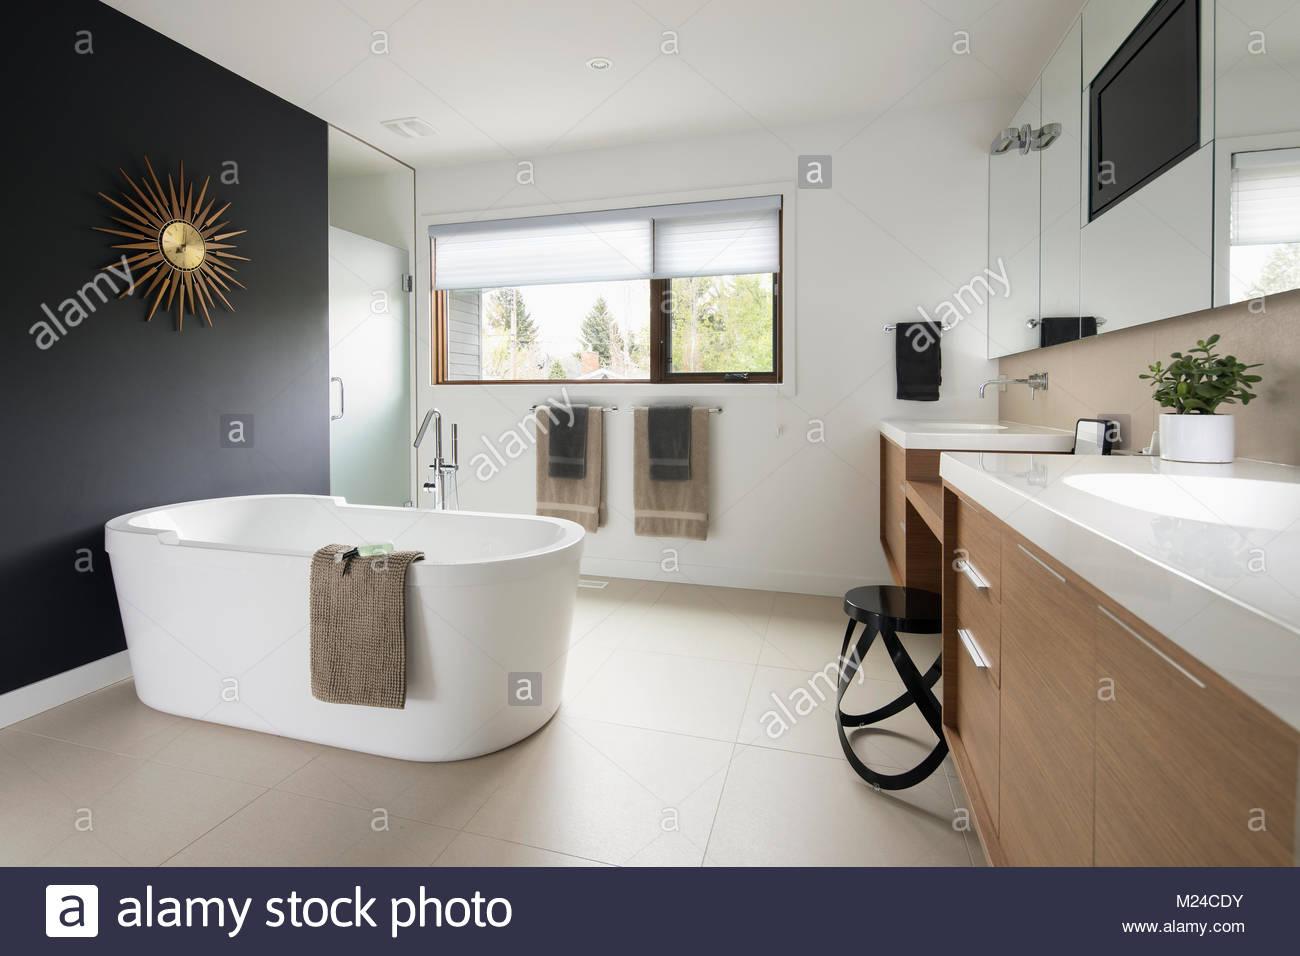 Vasca Da Bagno Moderno : Bagno moderno con vasca da bagno a pavimento u kaufen sie dieses